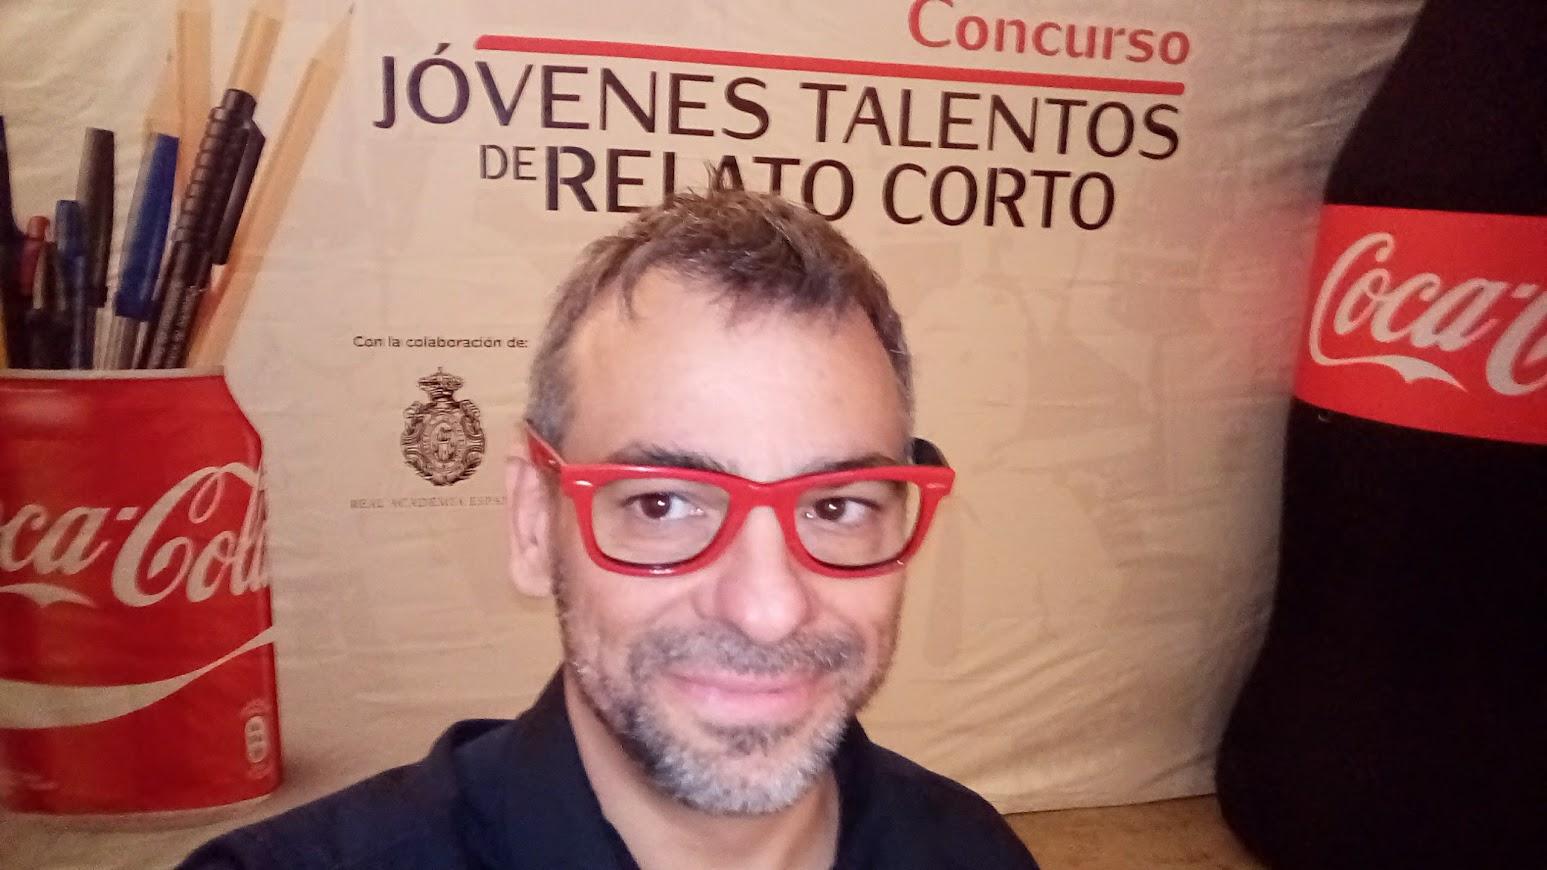 Alfonso-V-mago-jóvenes-talentos